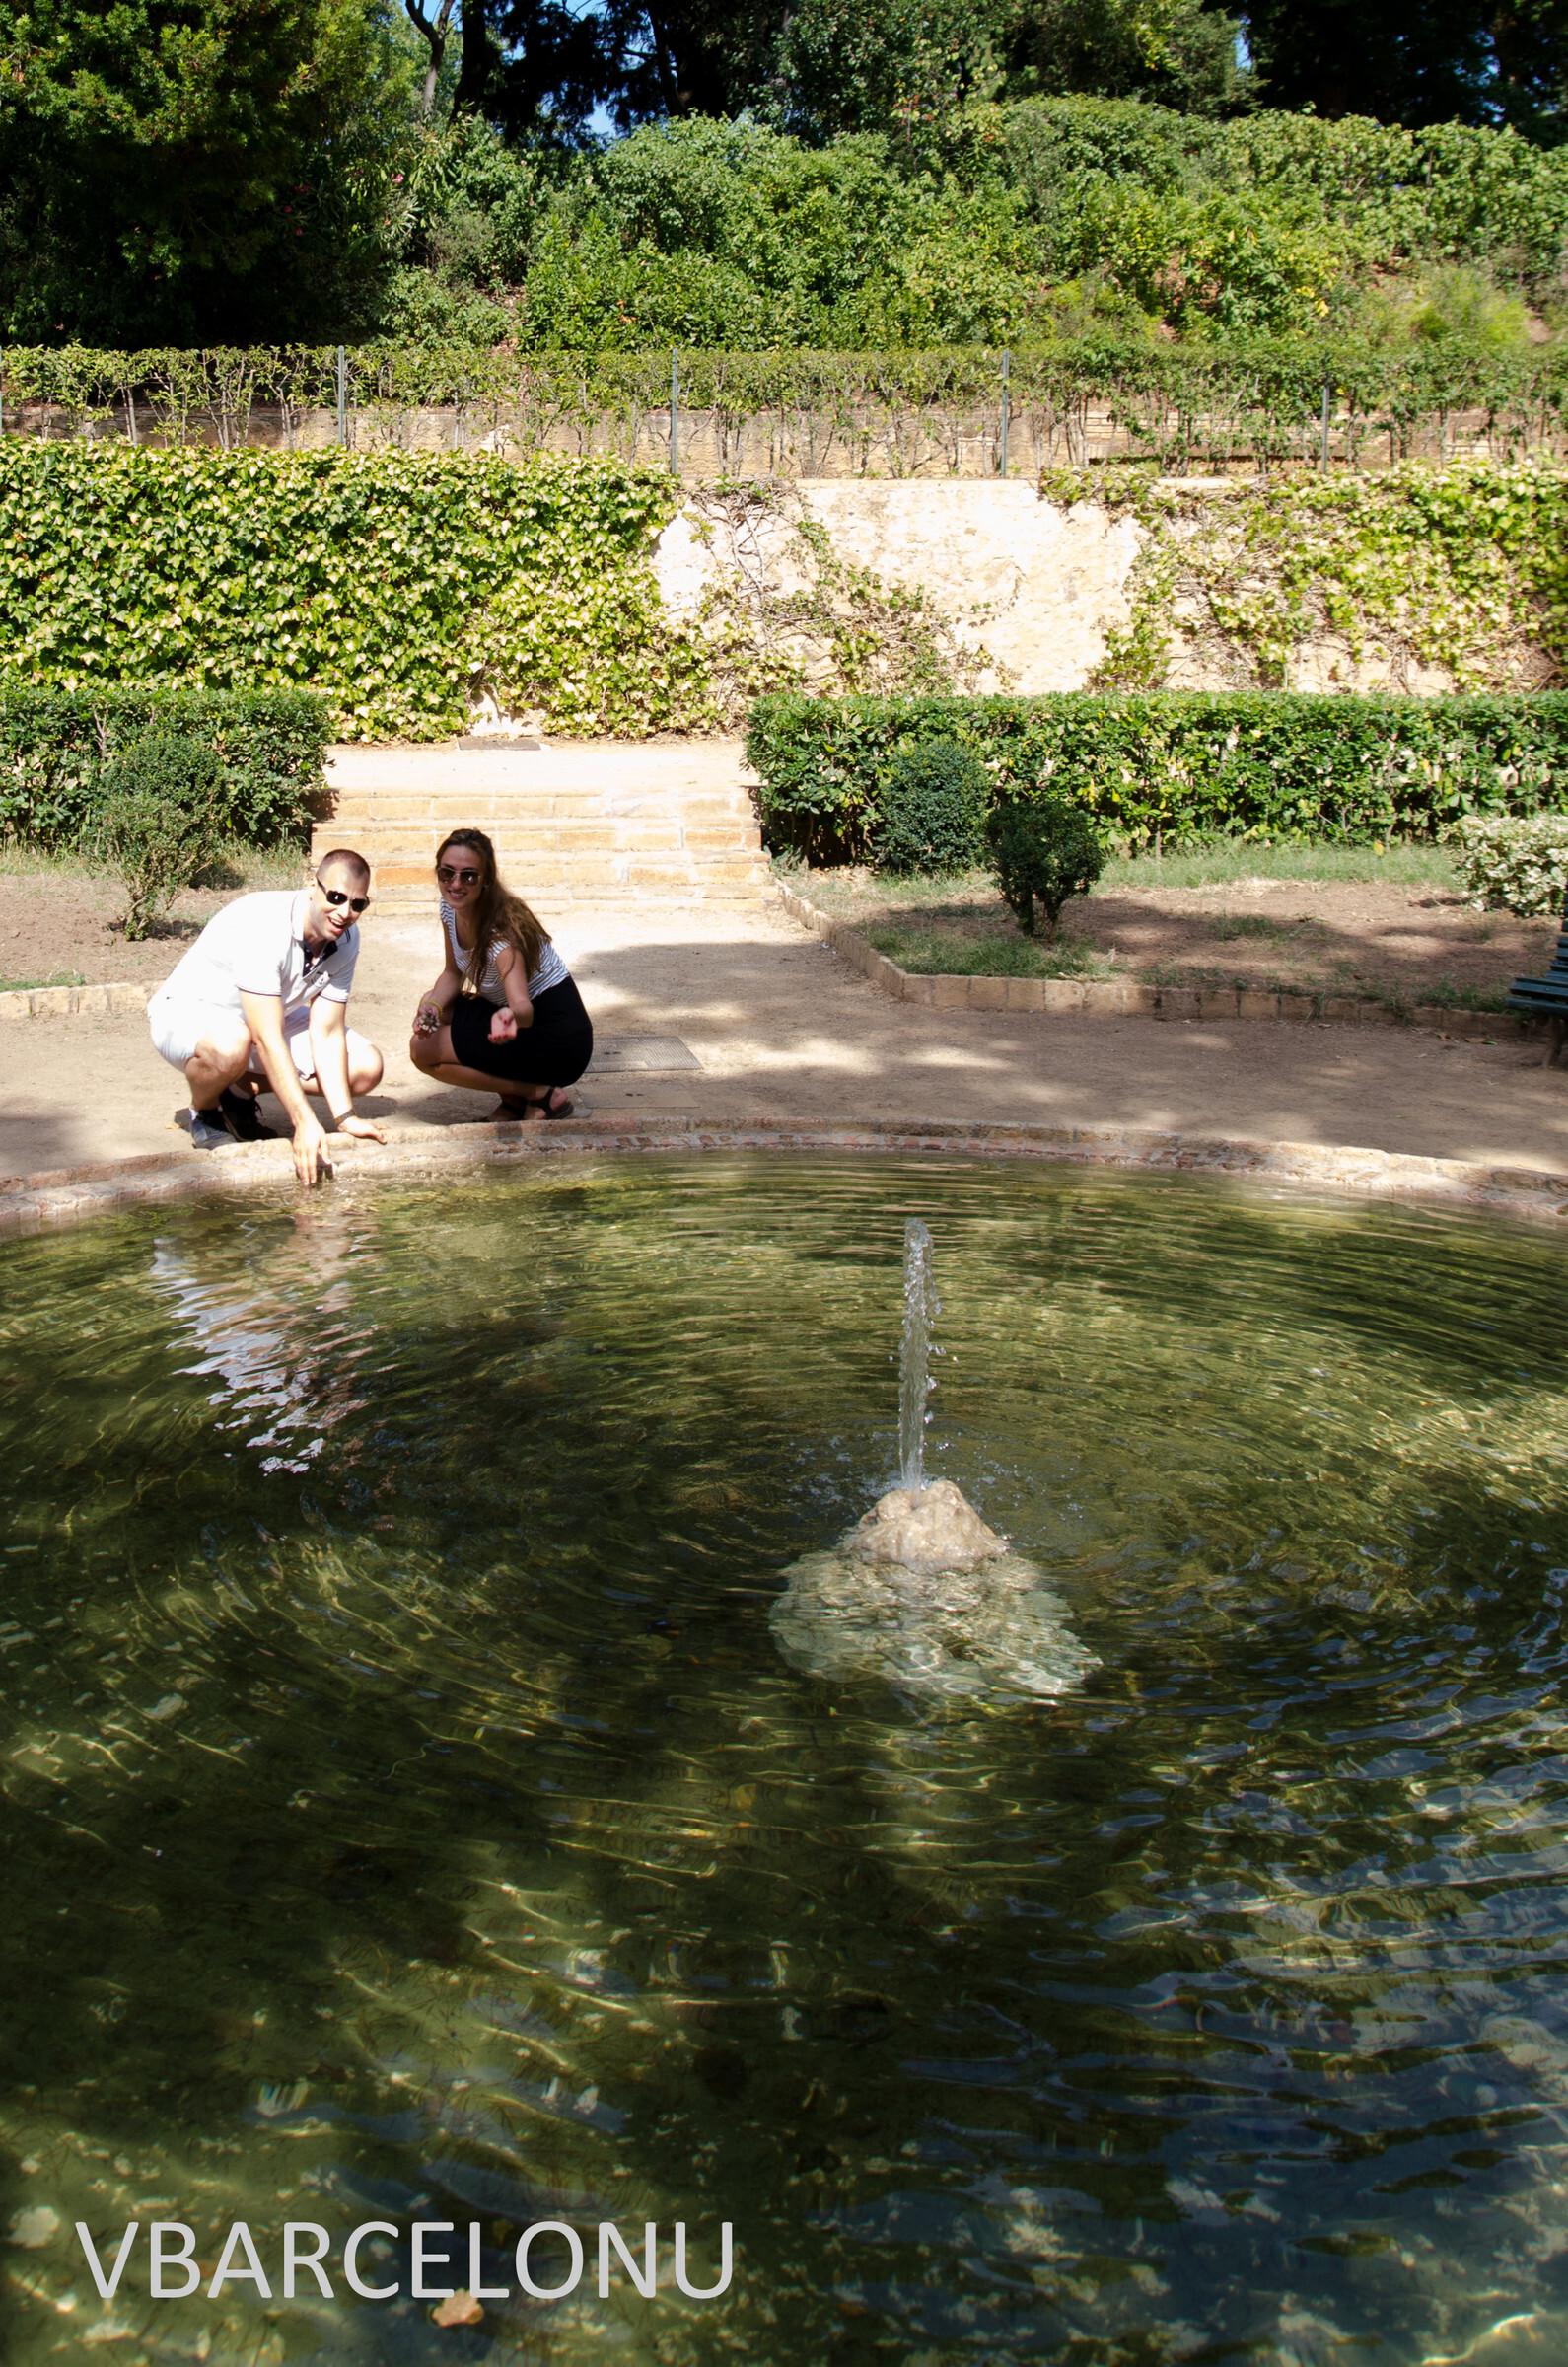 "Фото из альбома ""Парк-лабиринт Орта"", Барселона, Испания"